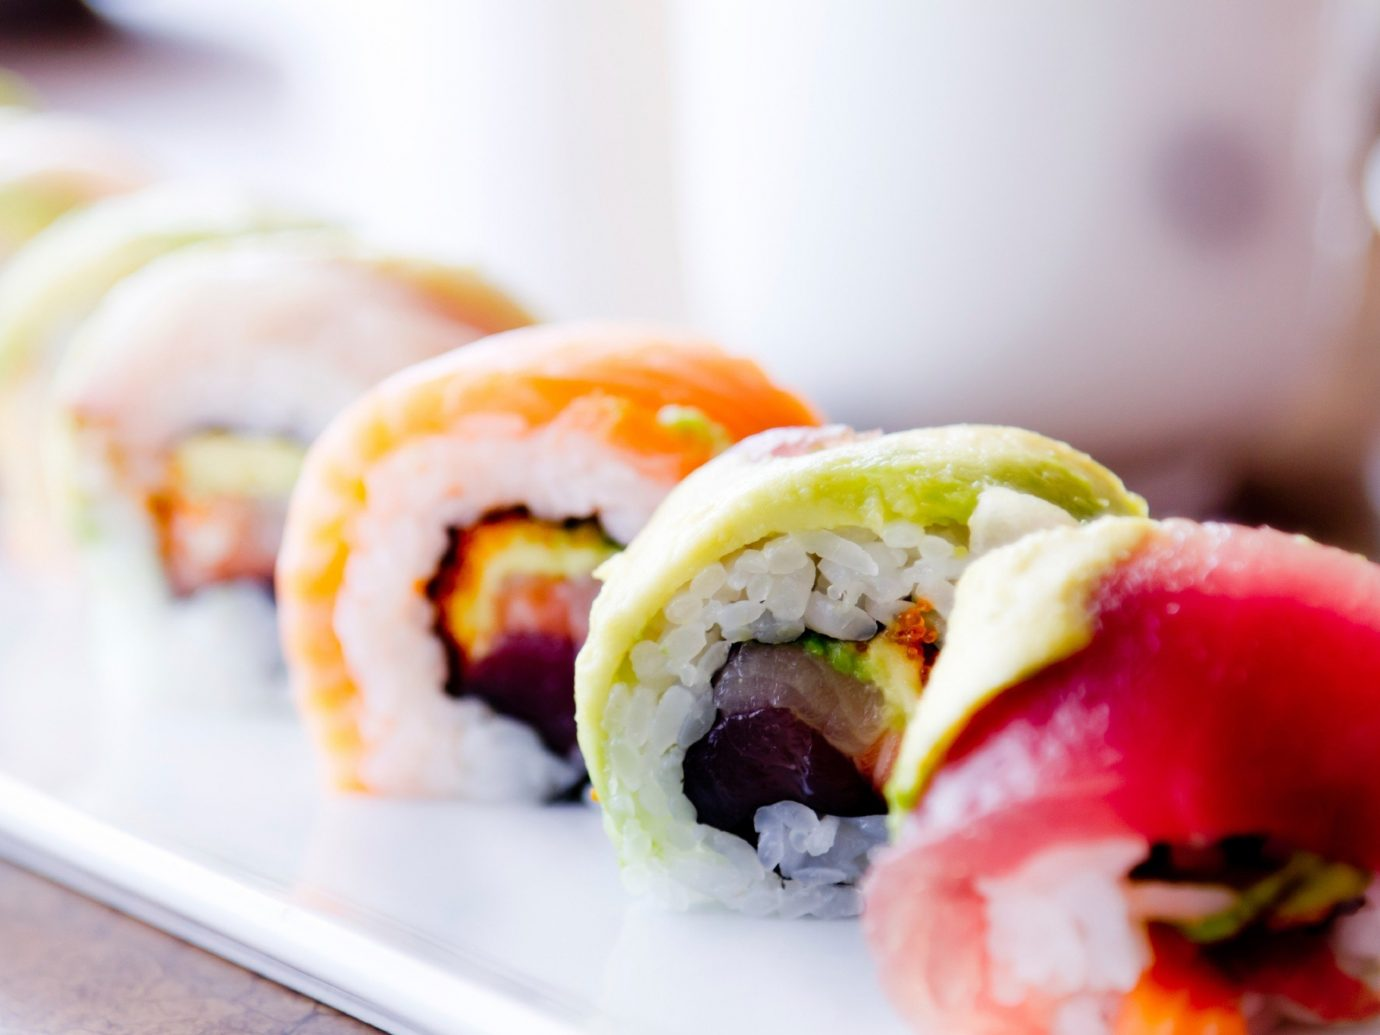 Offbeat dish food sushi indoor cuisine plate gimbap asian food california roll meal japanese cuisine close